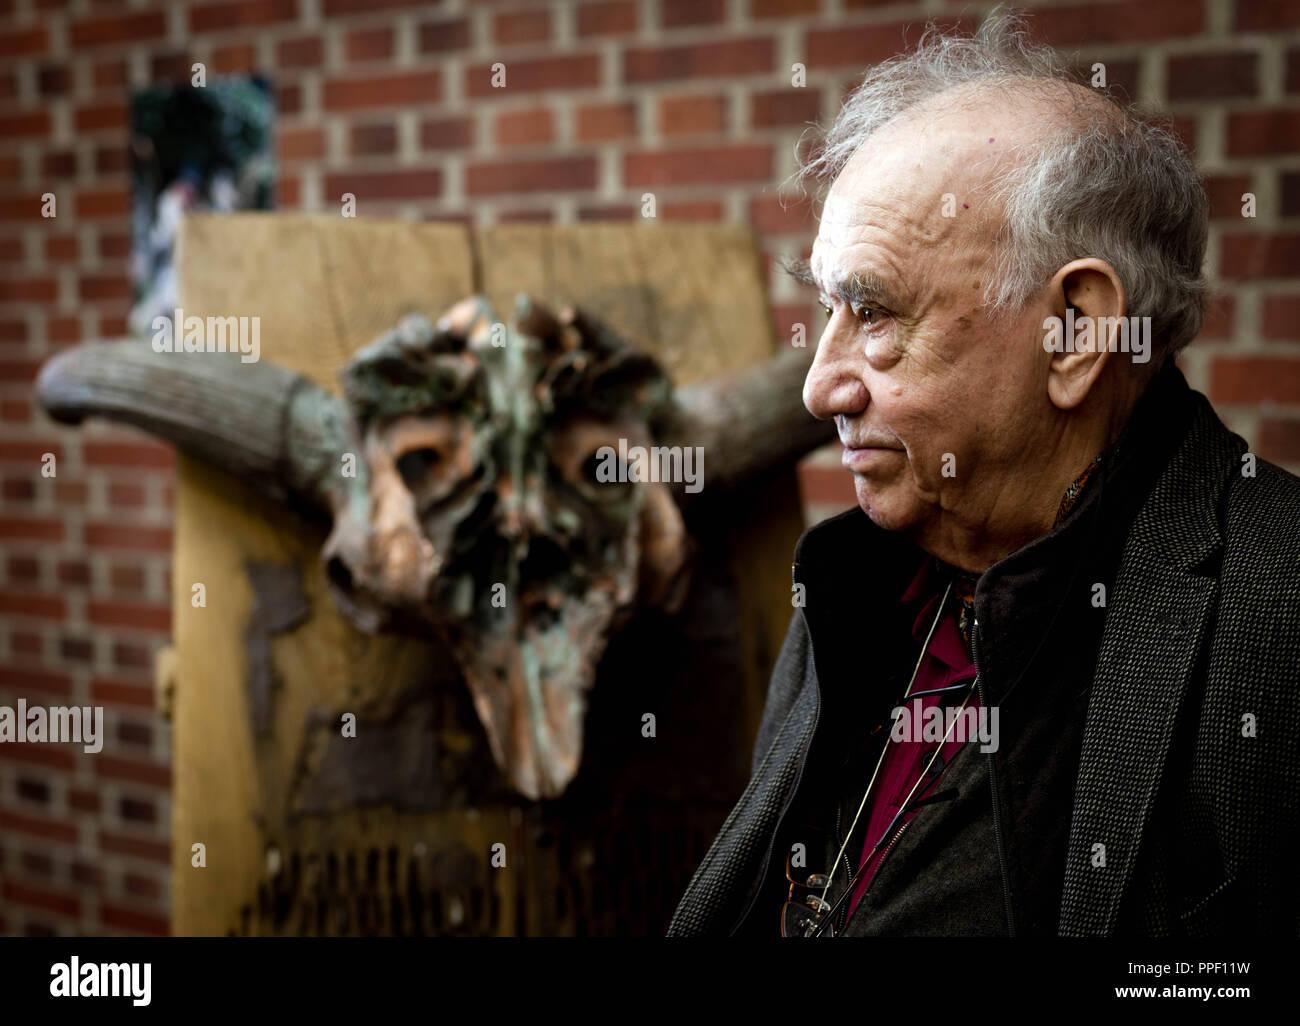 The artist Daniel Spoerri at the exhibition 'Jaeger und Gejaegte' (Hunter and hunted) at the Kuenstlerhaus Marktoberdorf. - Stock Image